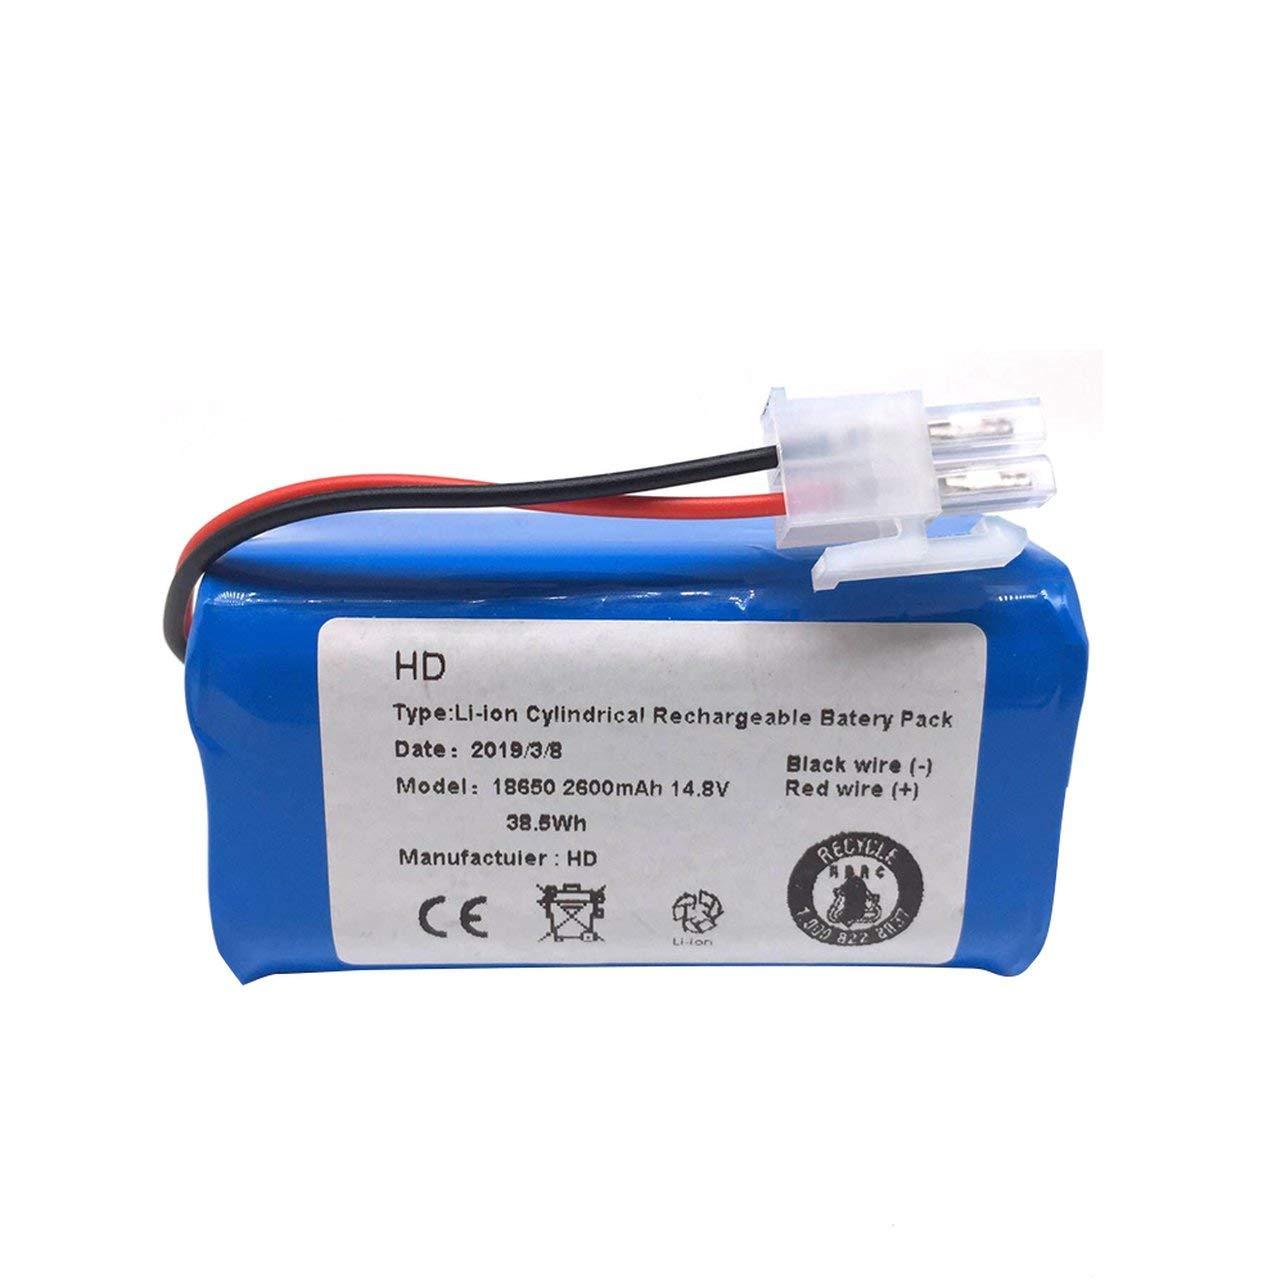 Azul WOSOSYEYO Bater/ía Original para ilife V7s A6 V7s Pro X620 Piezas del Aspirador Aspirador de Mortor